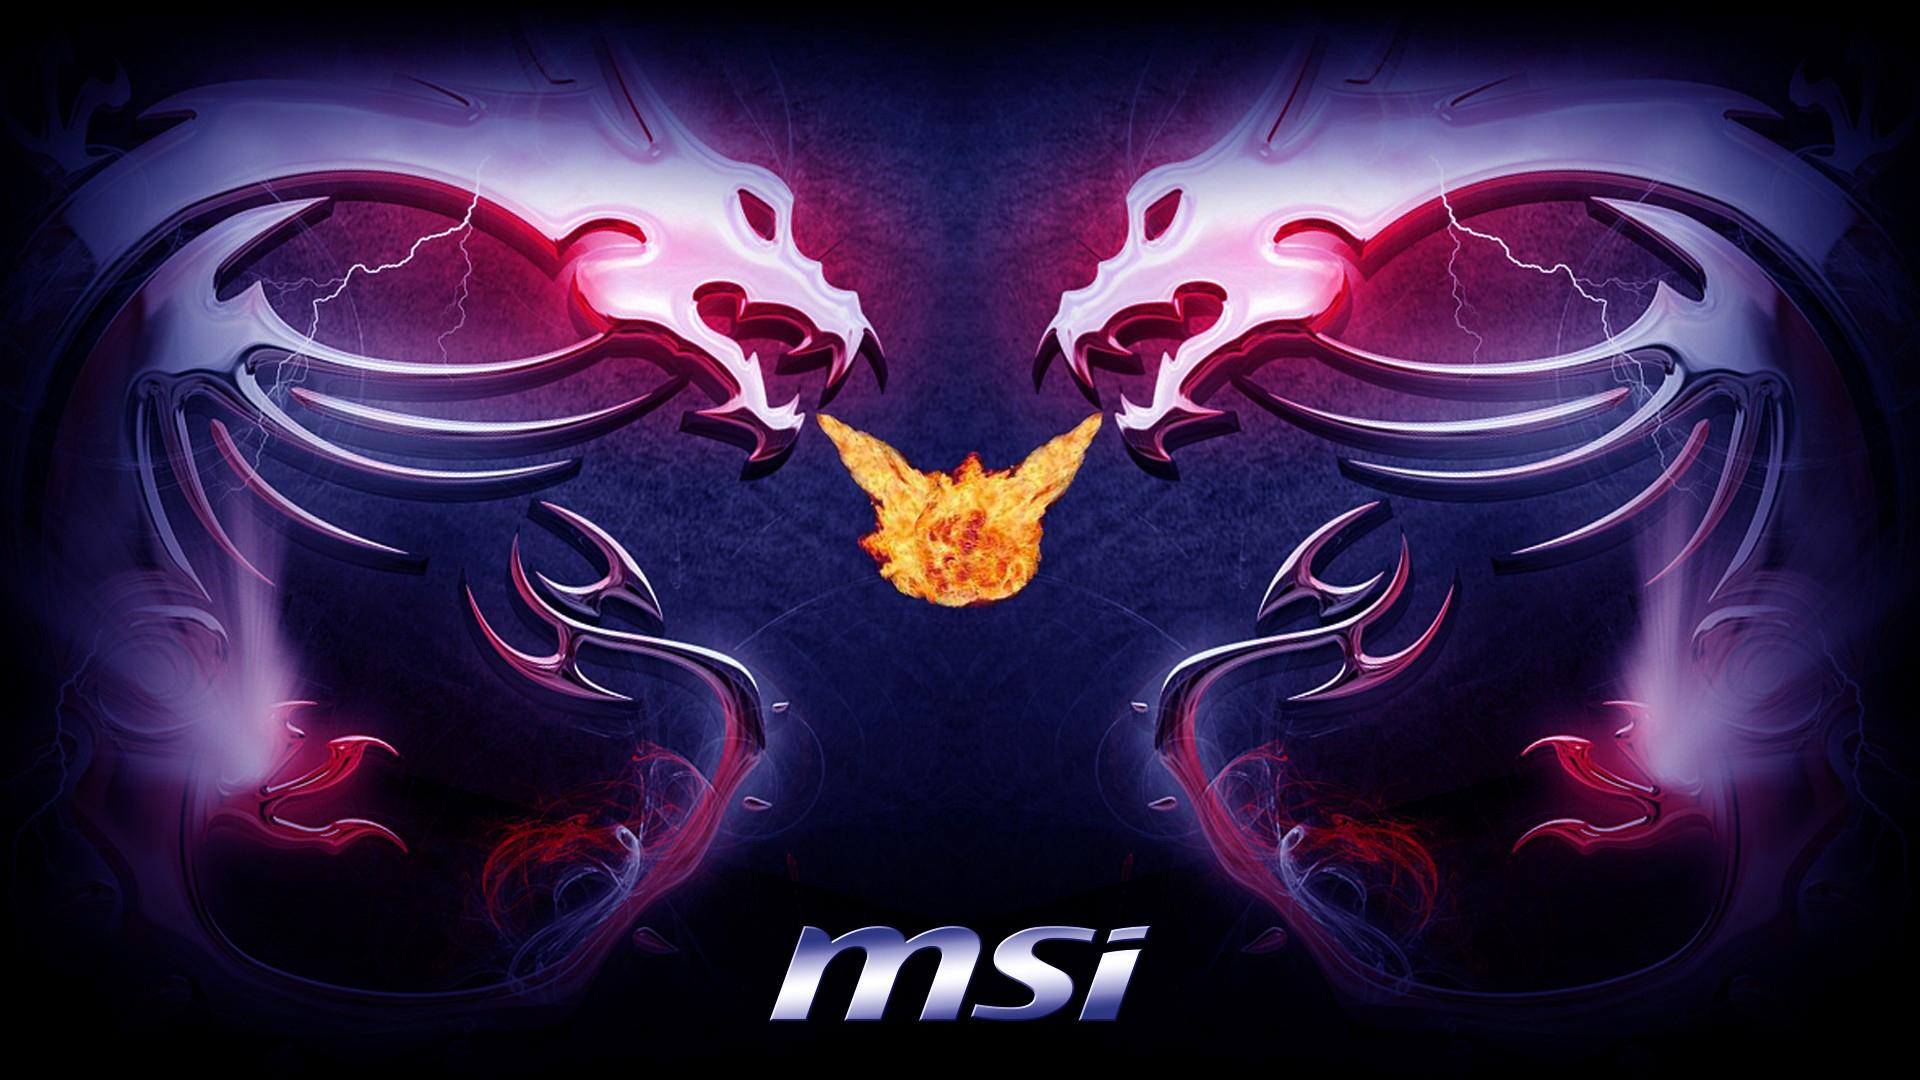 1080p msi wallpaper - photo #26